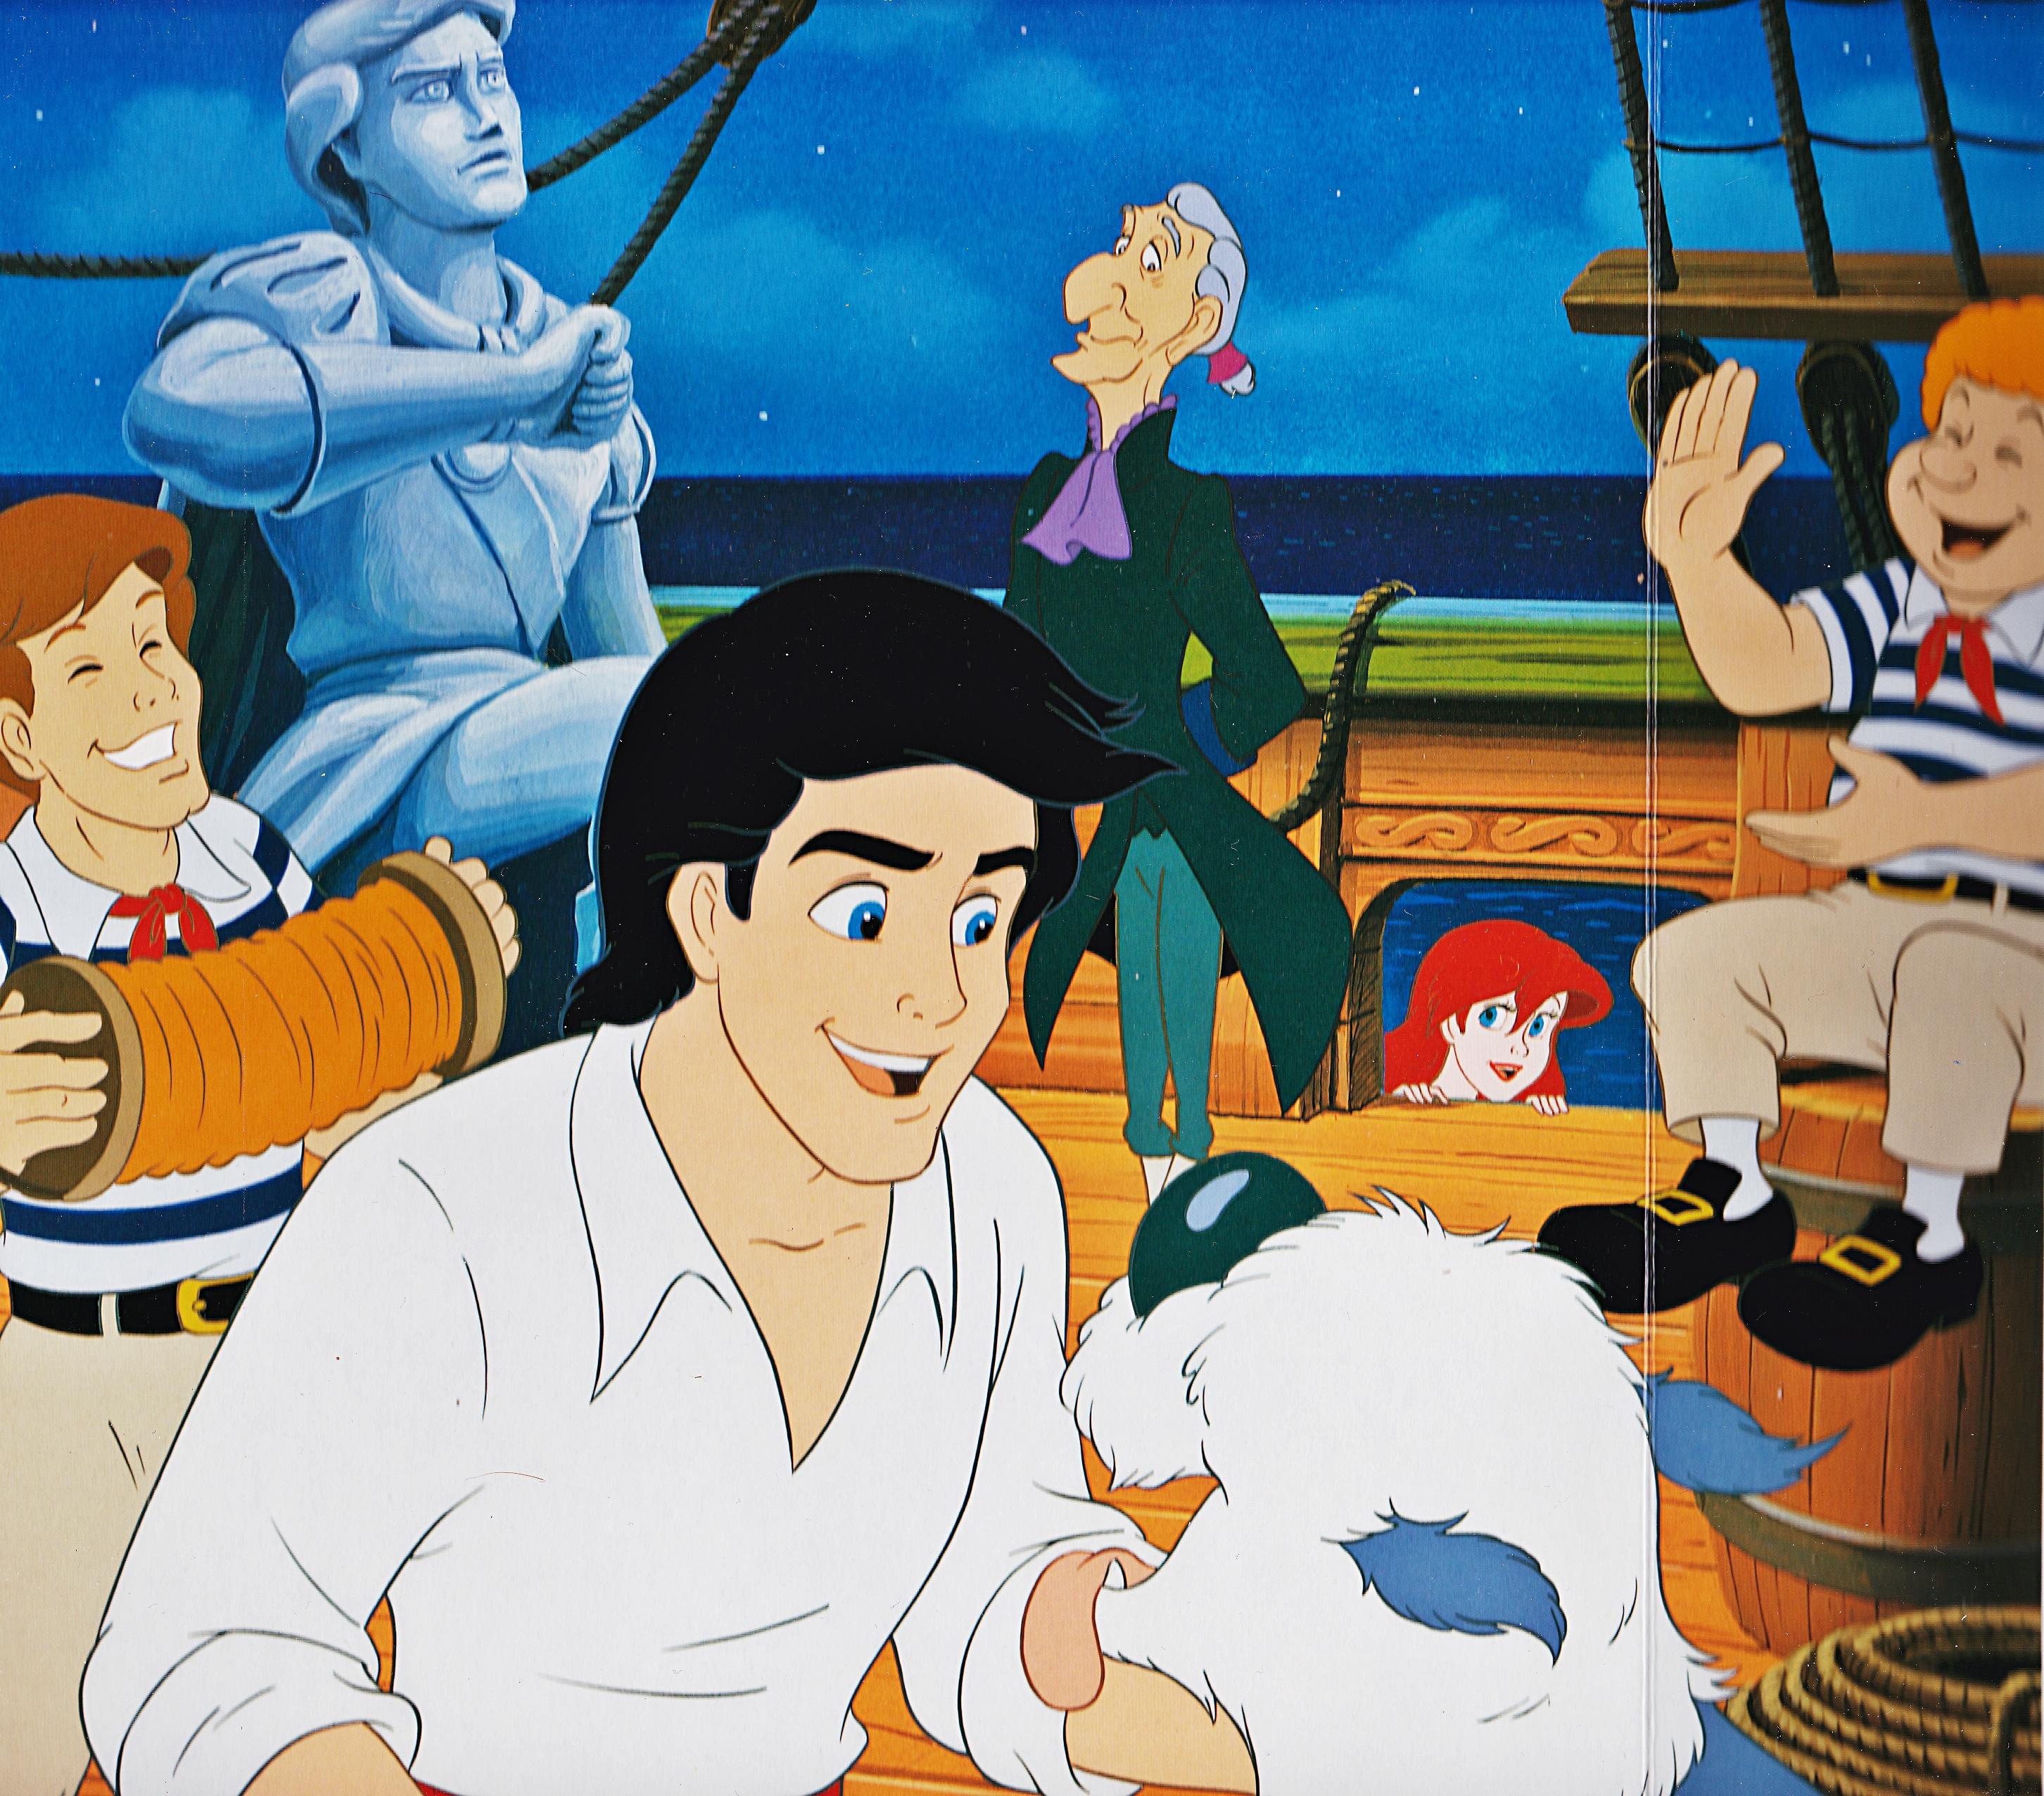 Walt Disney Book Images - Prince Eric, Max, Sir Grimsby & Princess Ariel